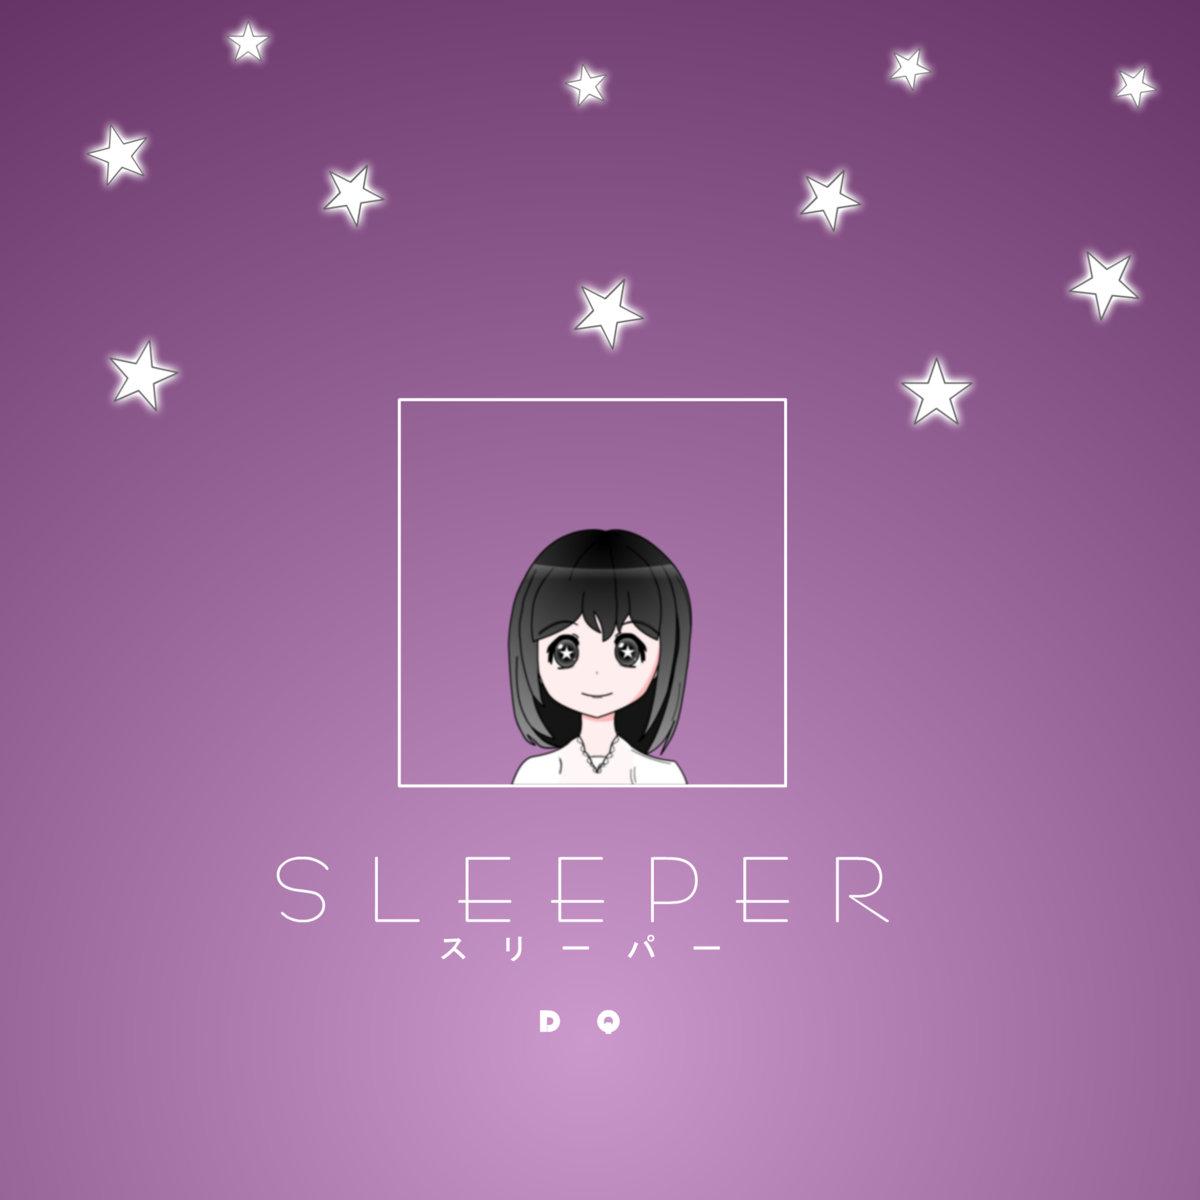 Sleeper (album)